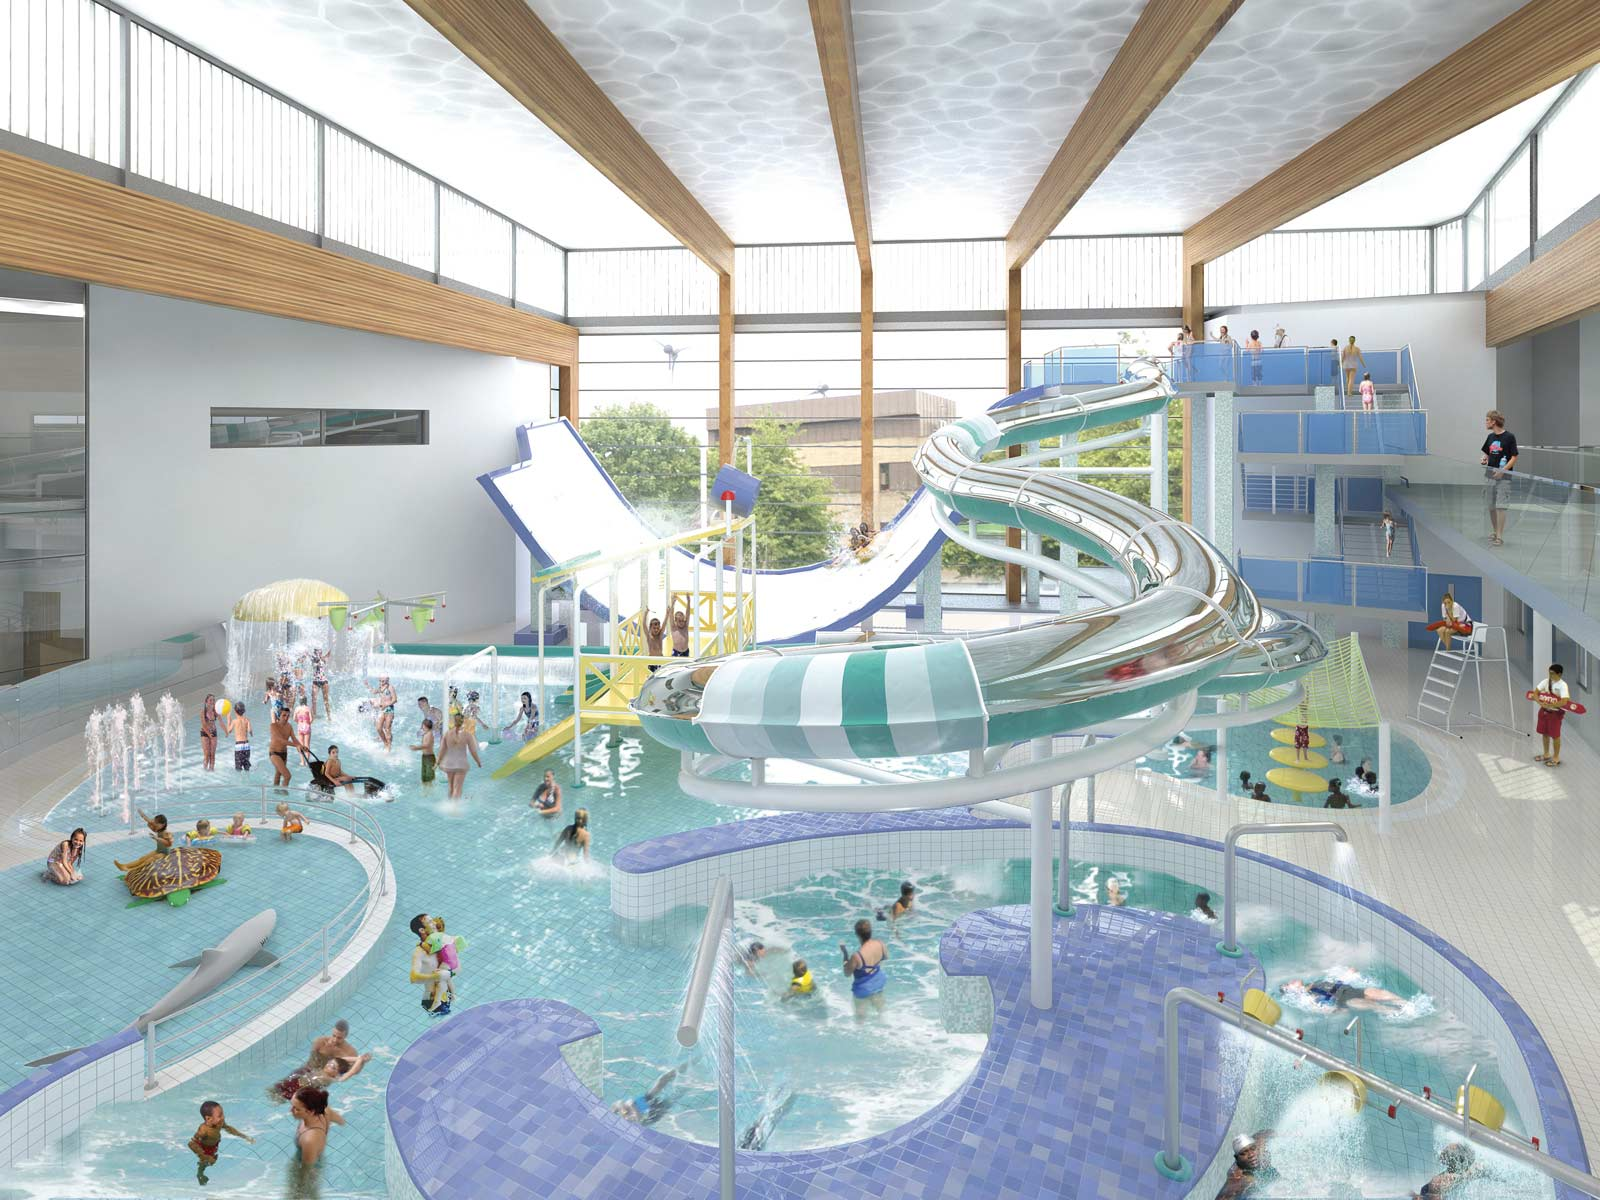 Huddersfield Sports Centre Huddersfield 1053 1 Construction Enquirer